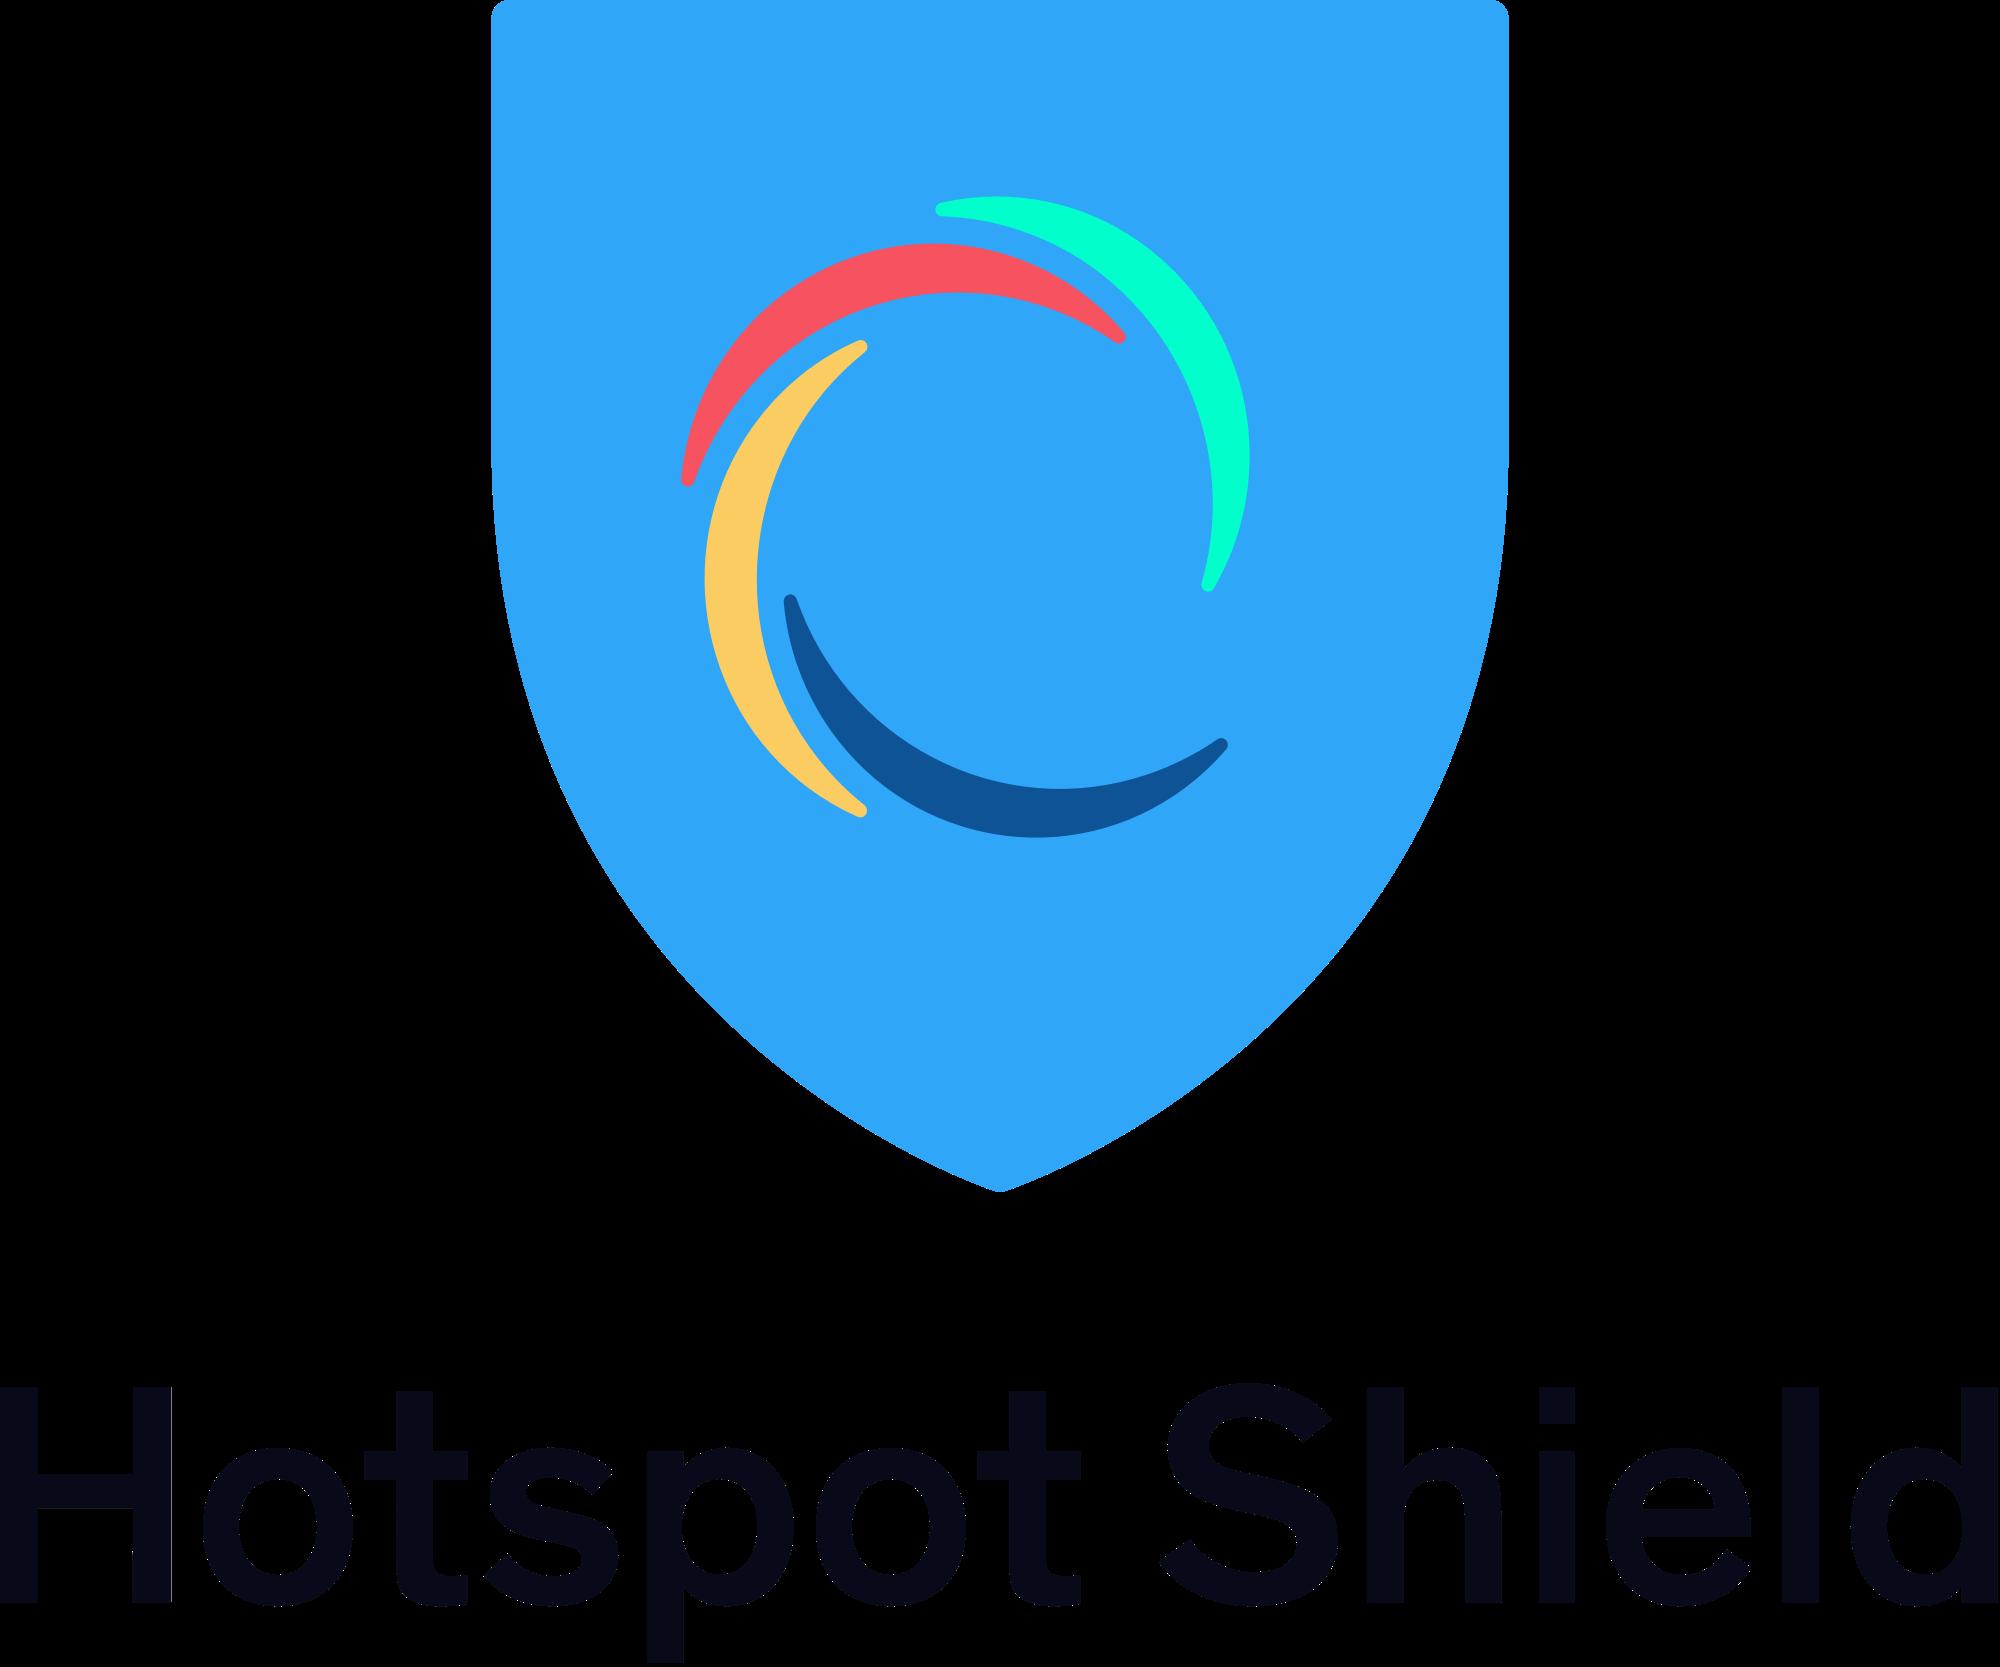 Hotspot shield Premium VPN for android,Hotspot shield android vpn latest cracked version 2019